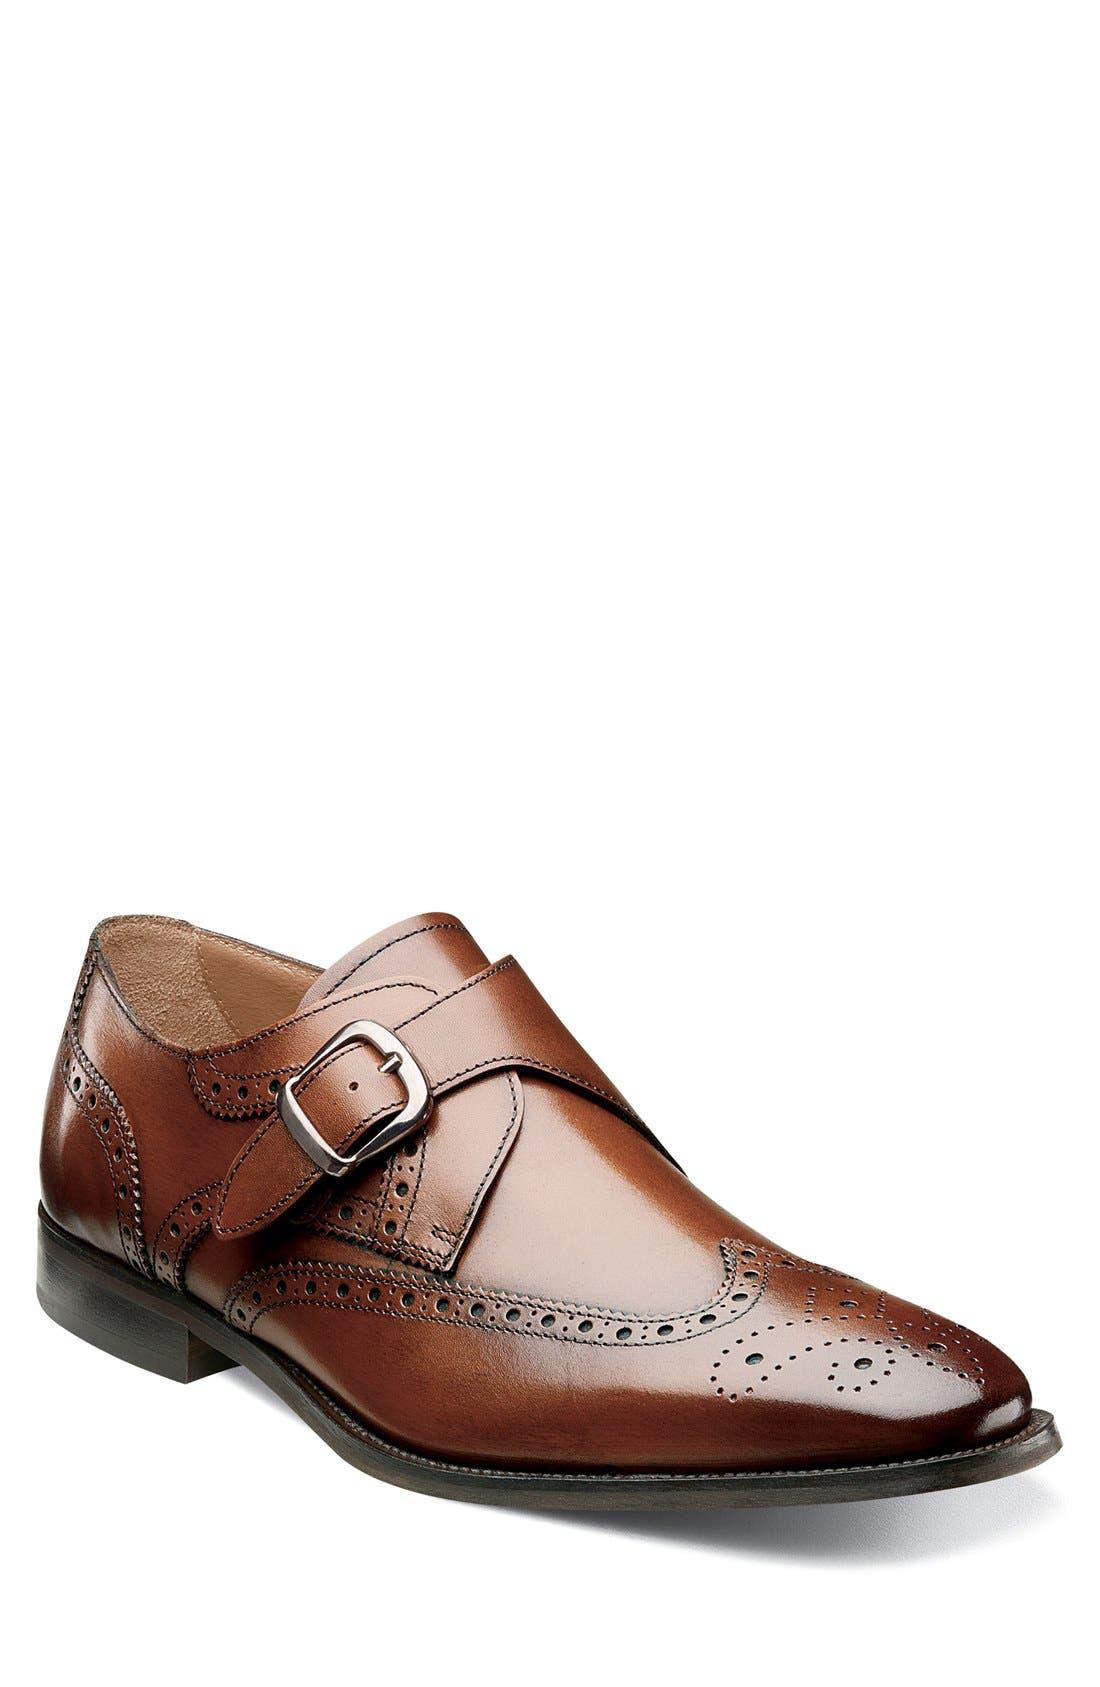 FLORSHEIM 'Sabato' Wingtip Monk Strap Shoe, Main, color, MEDIUM BROWN